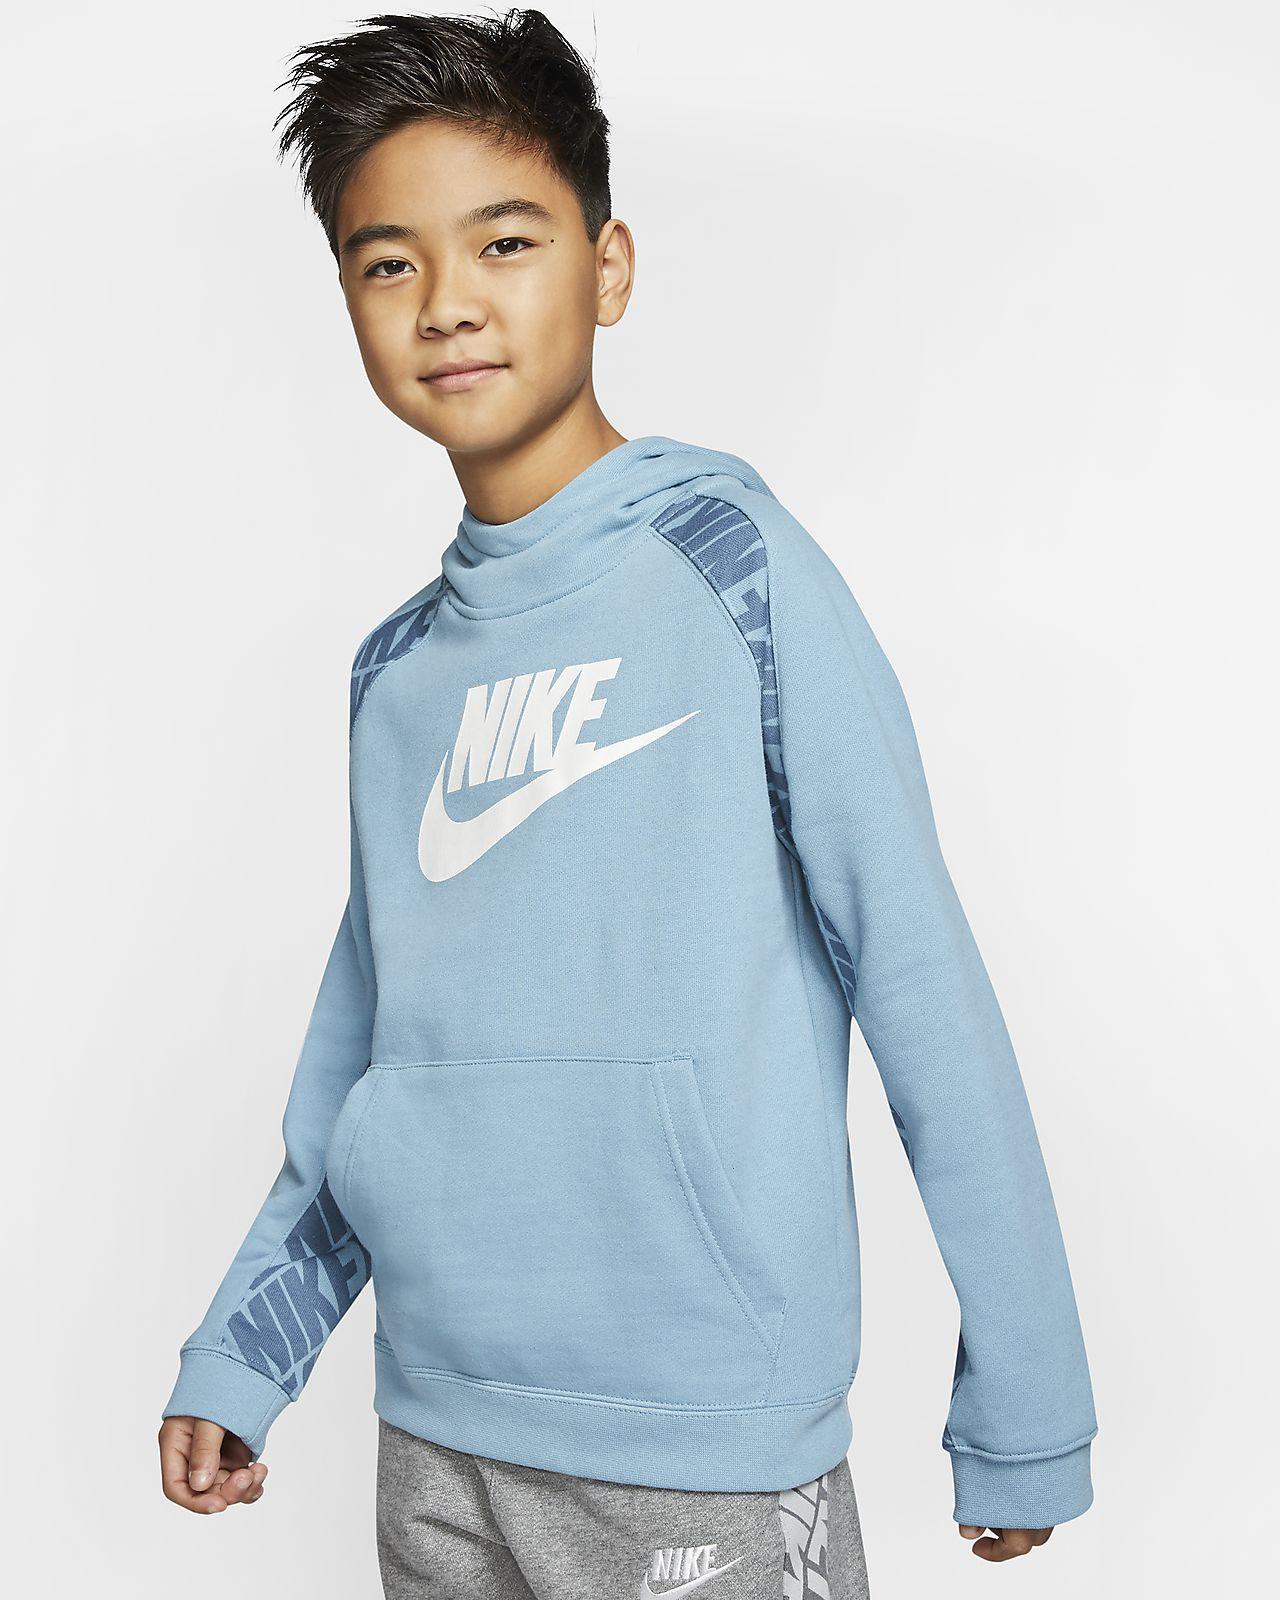 Sweat à capuche en molleton Nike Sportswear pour Garçon plus âgé